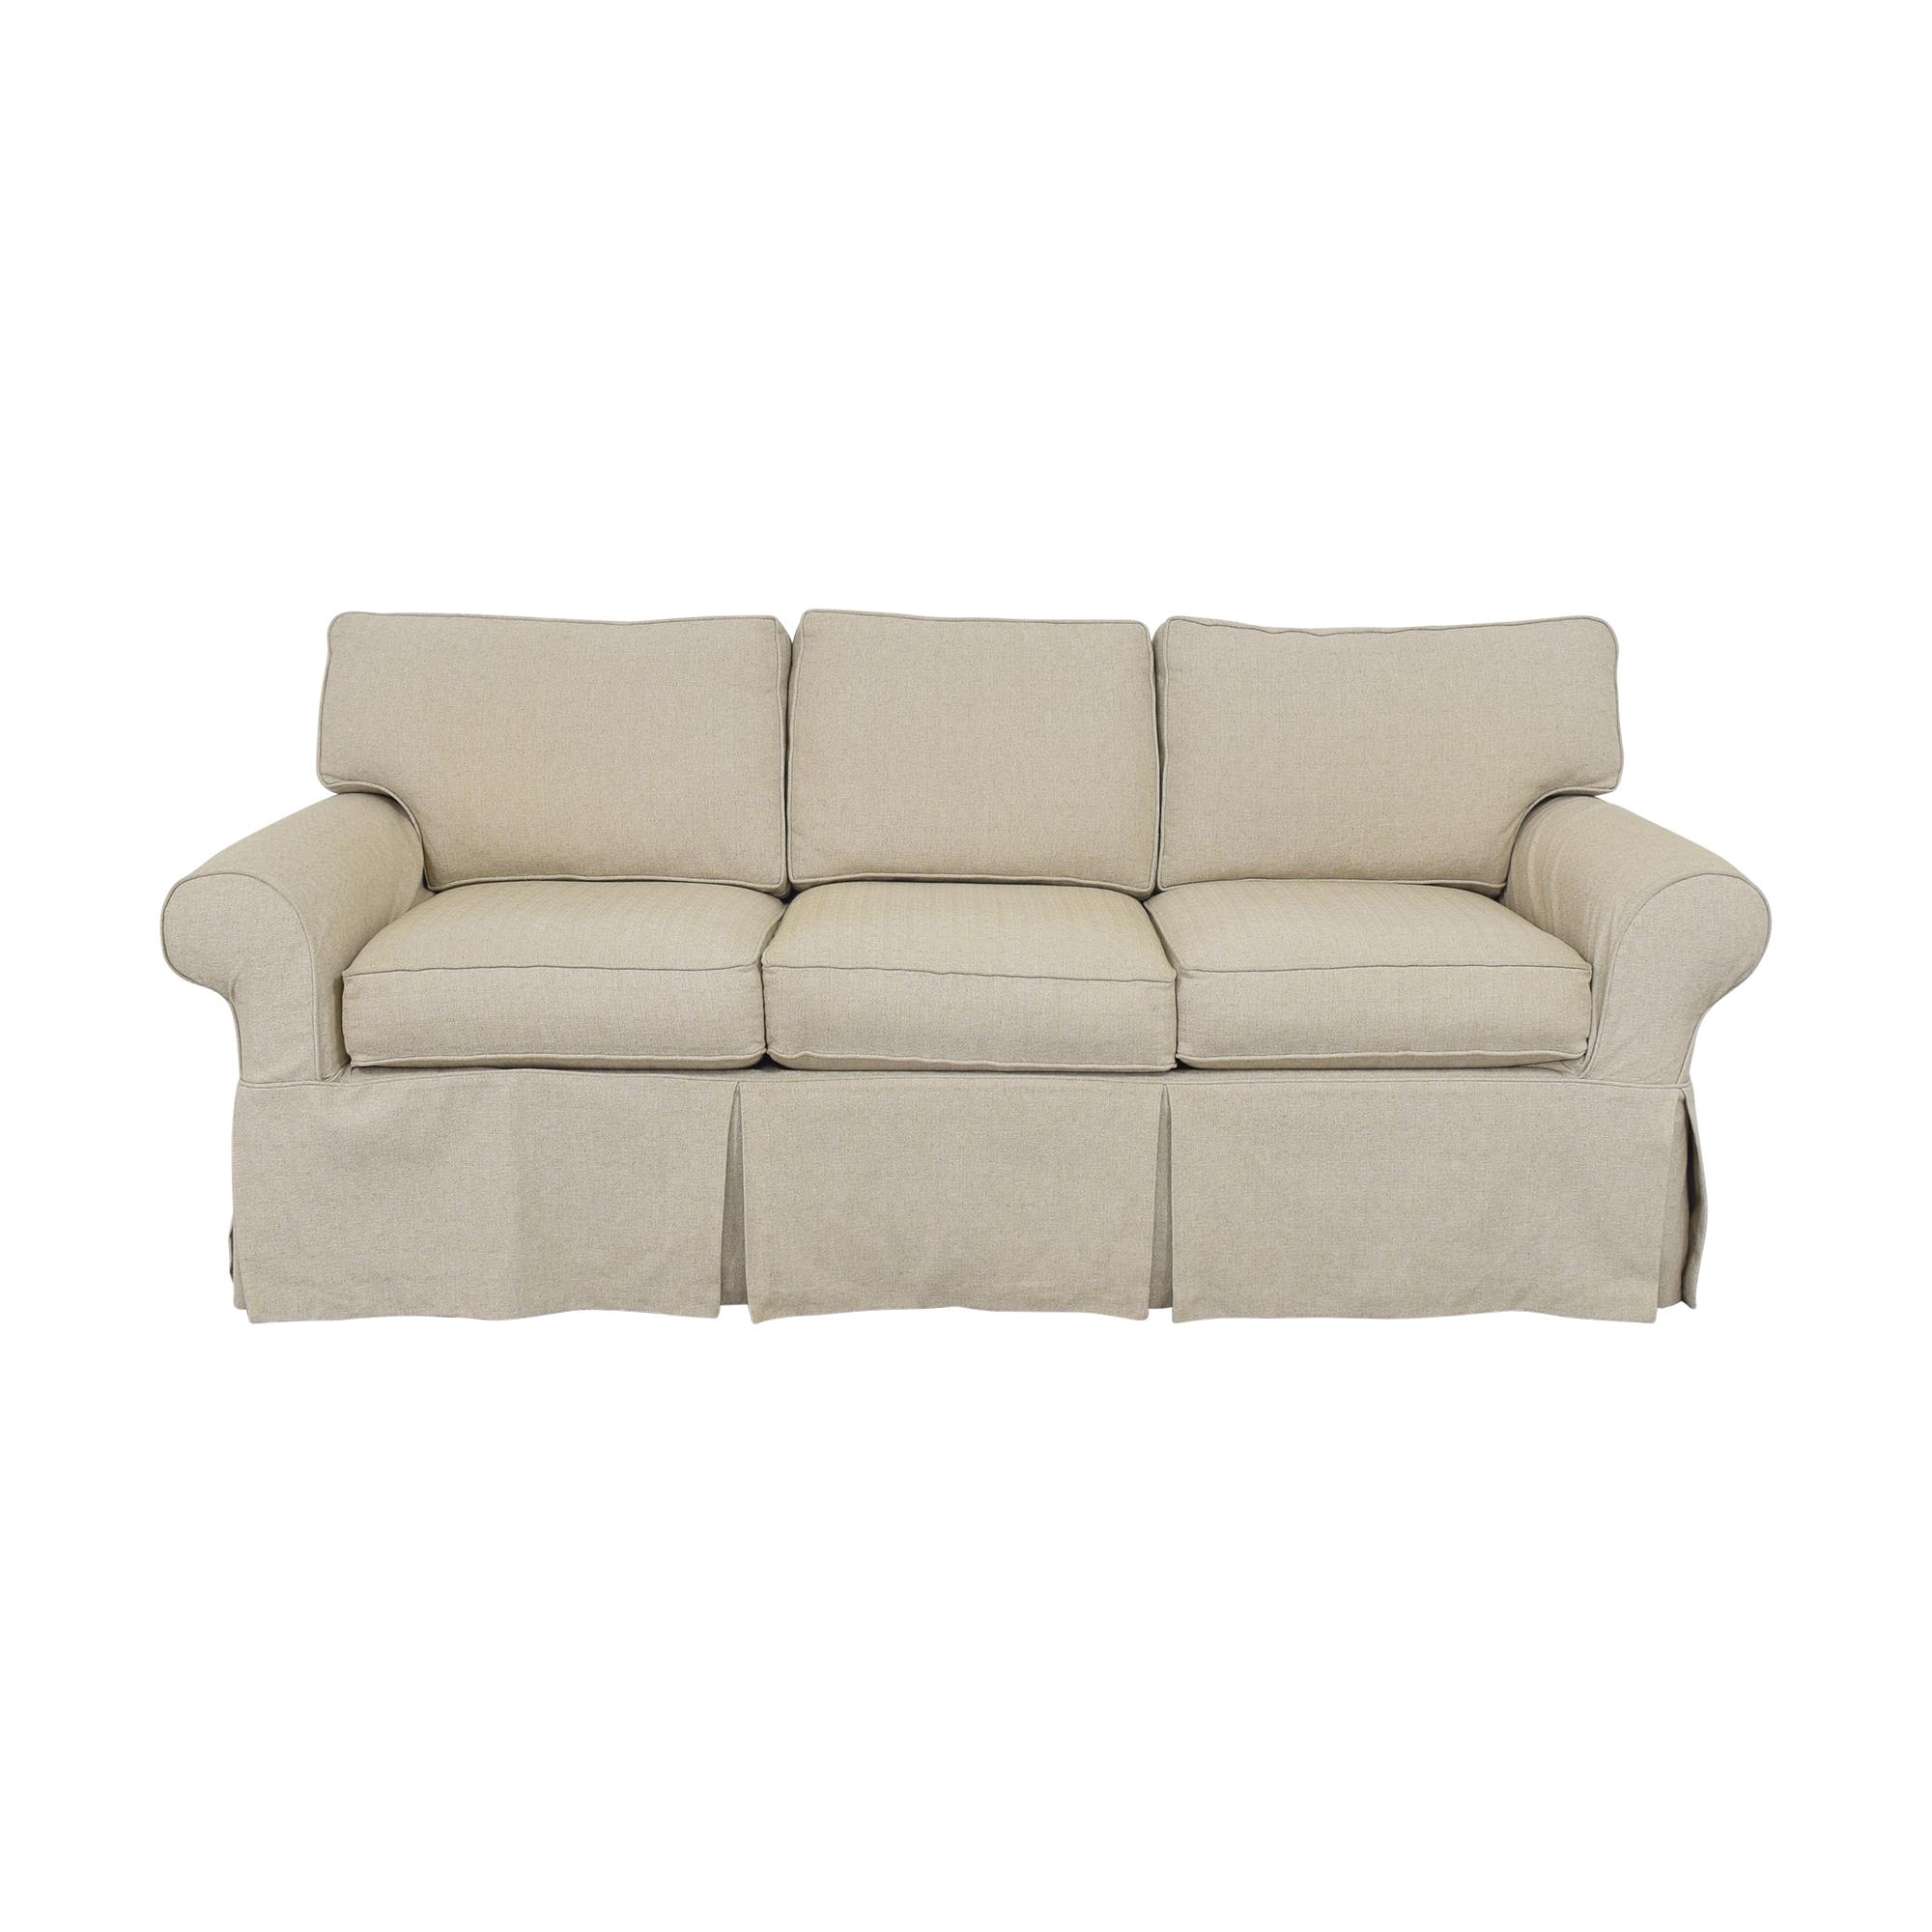 Ethan Allen Ethan Allen Bennett Roll Arm Sofa with Slipcover second hand